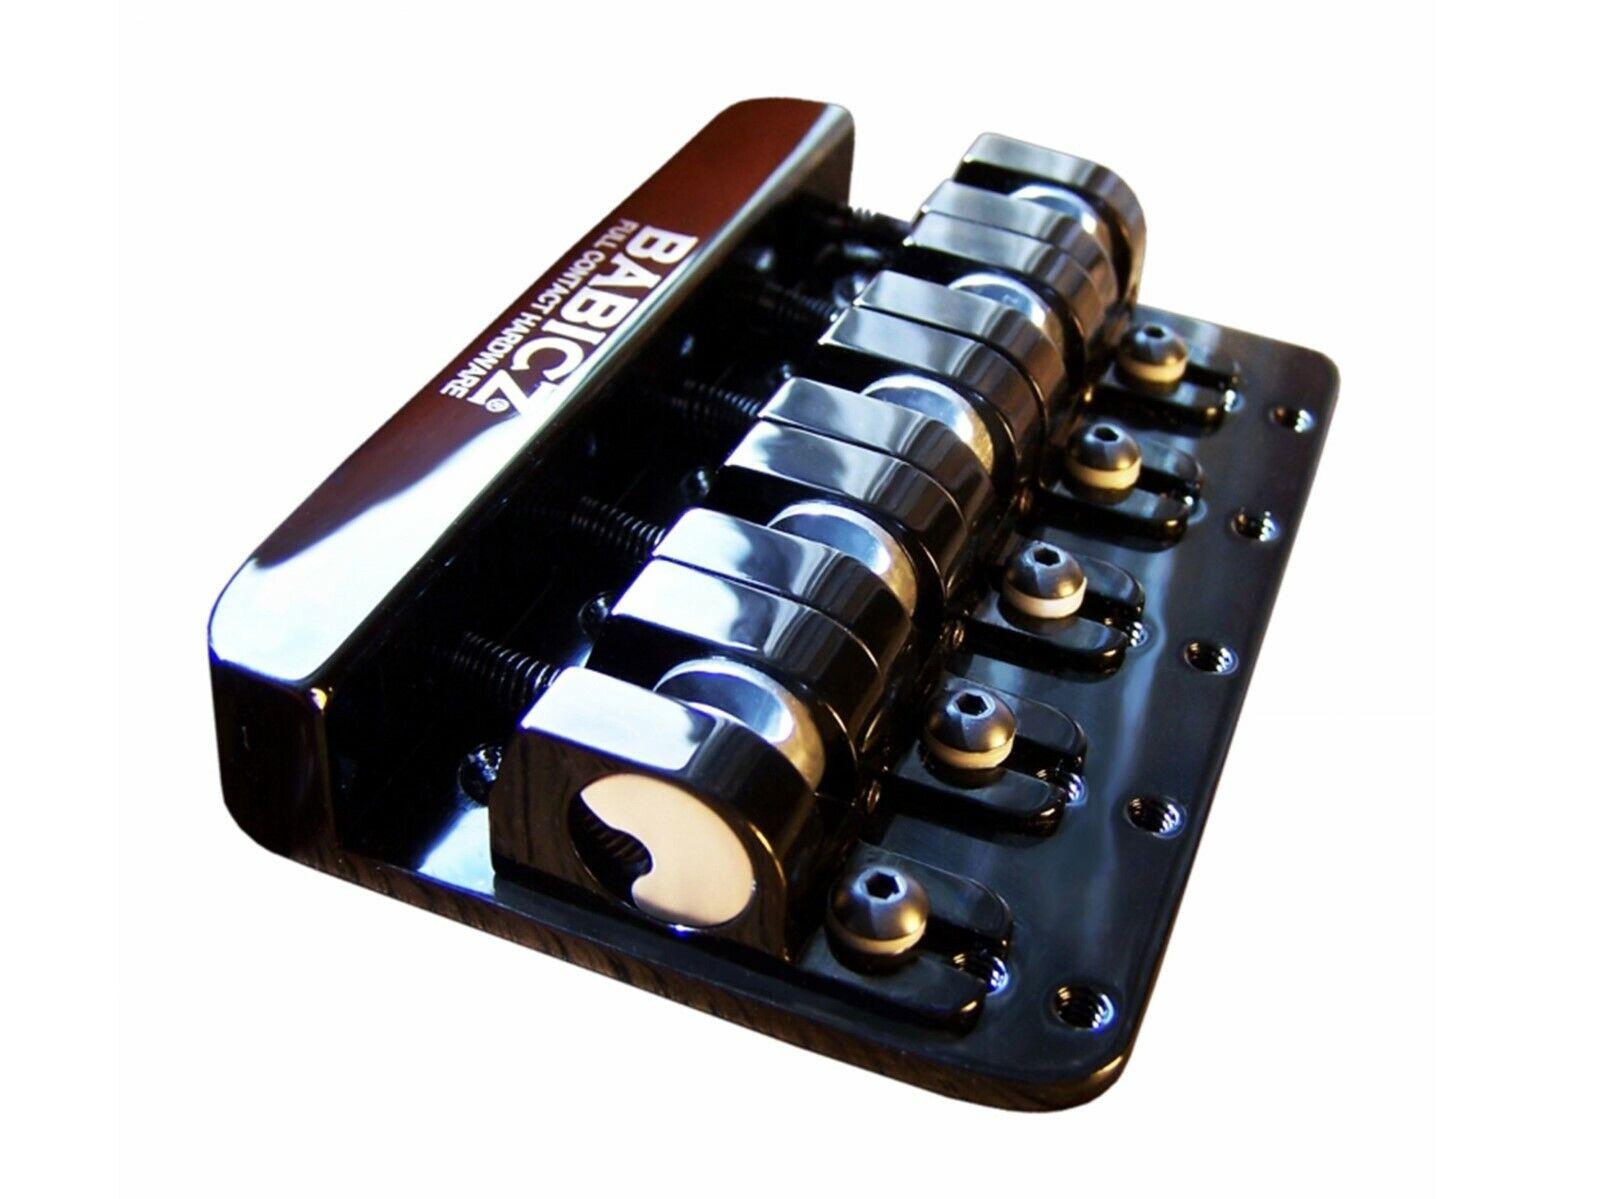 Babicz Full Contact Hardware FCH 5-String Bass Bridge - schwarz or Gold Finish